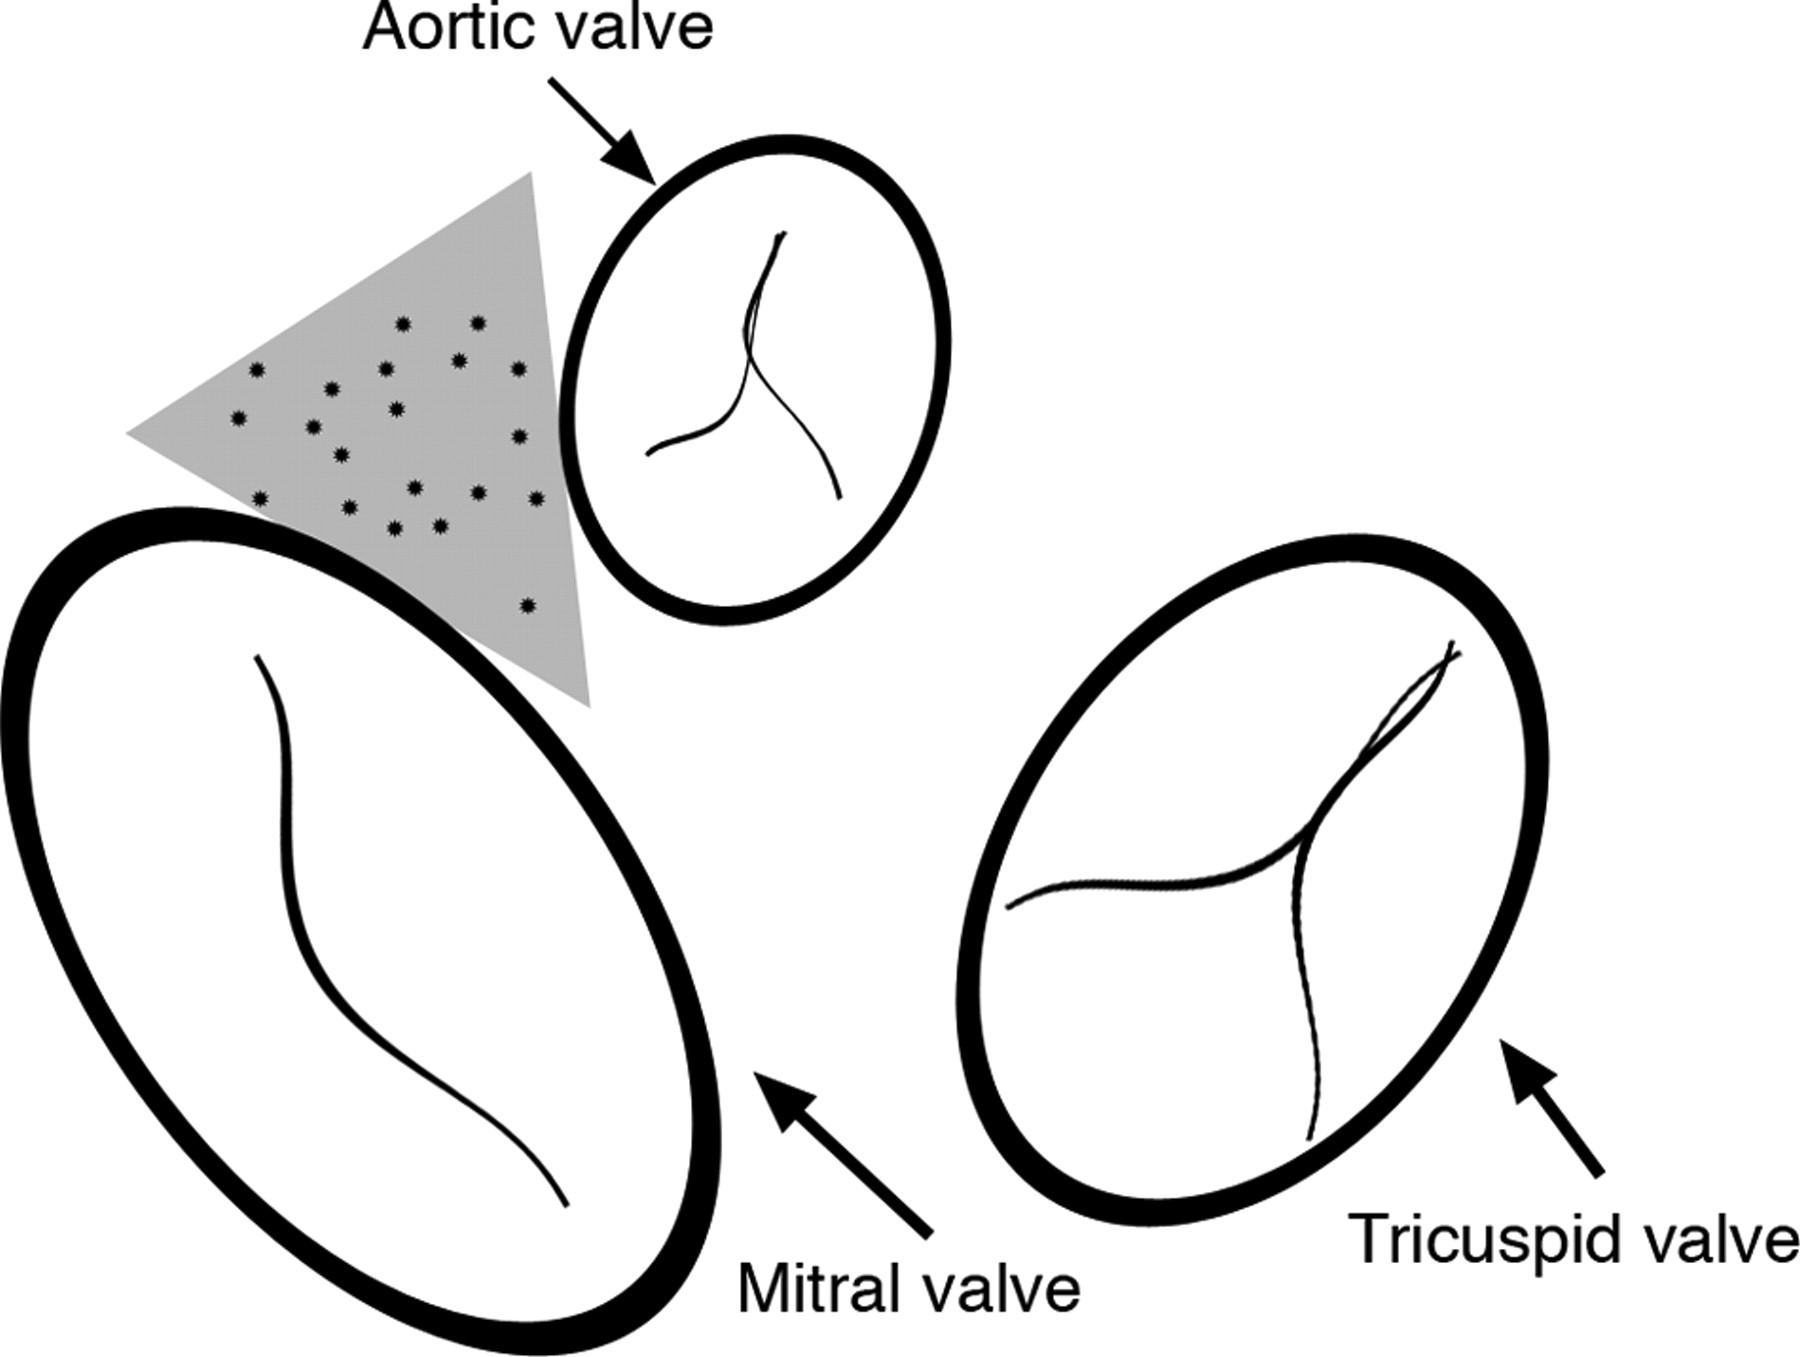 Ventricular Tachycardia Arising From The Aortomitral